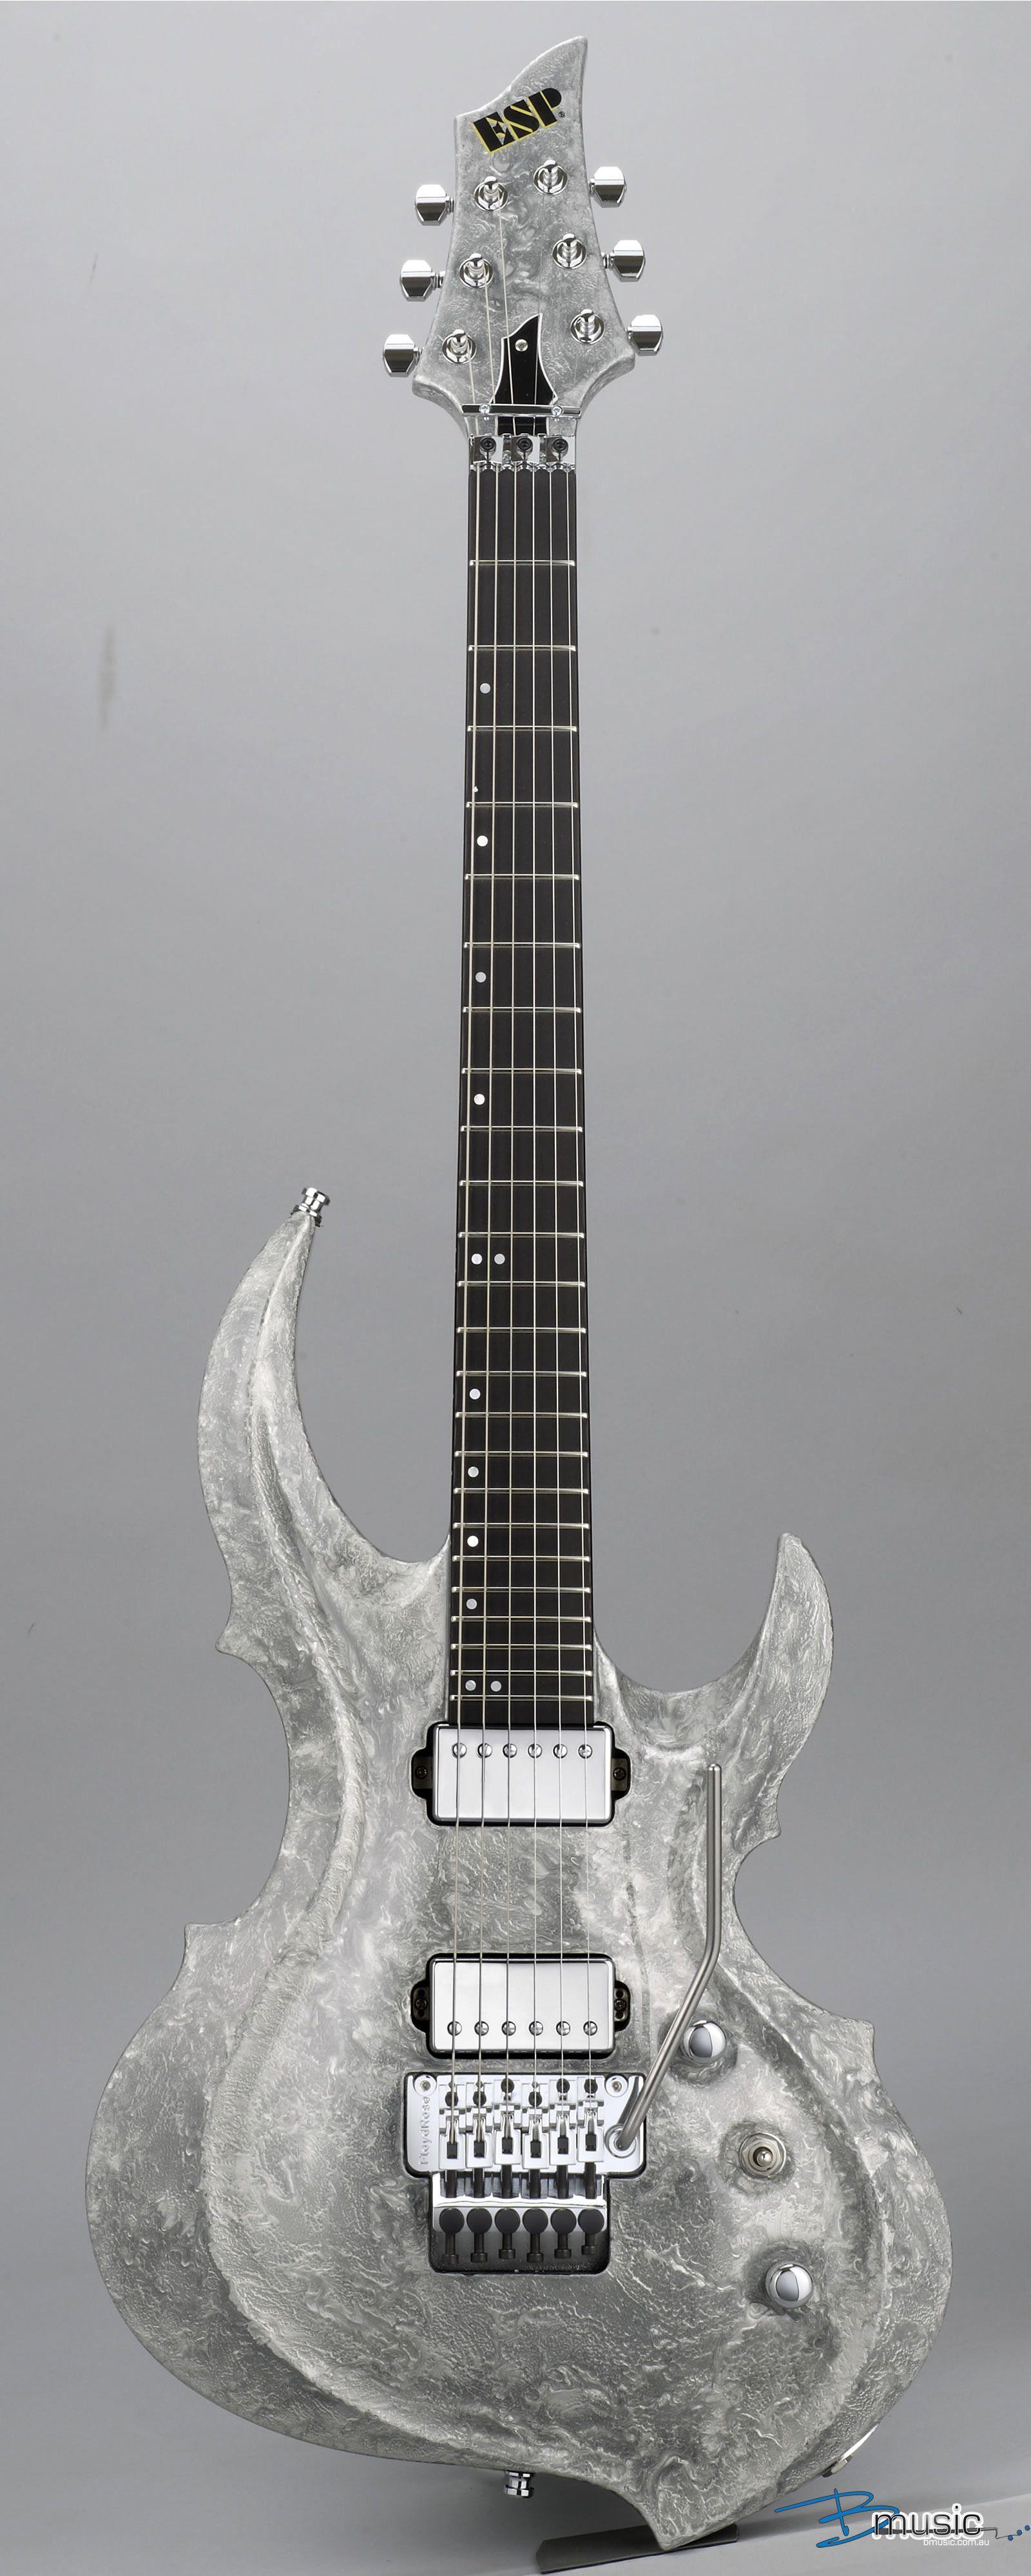 Esp Frx Ctm Liquid Metal Silver Gitary Elektryczne Gitara